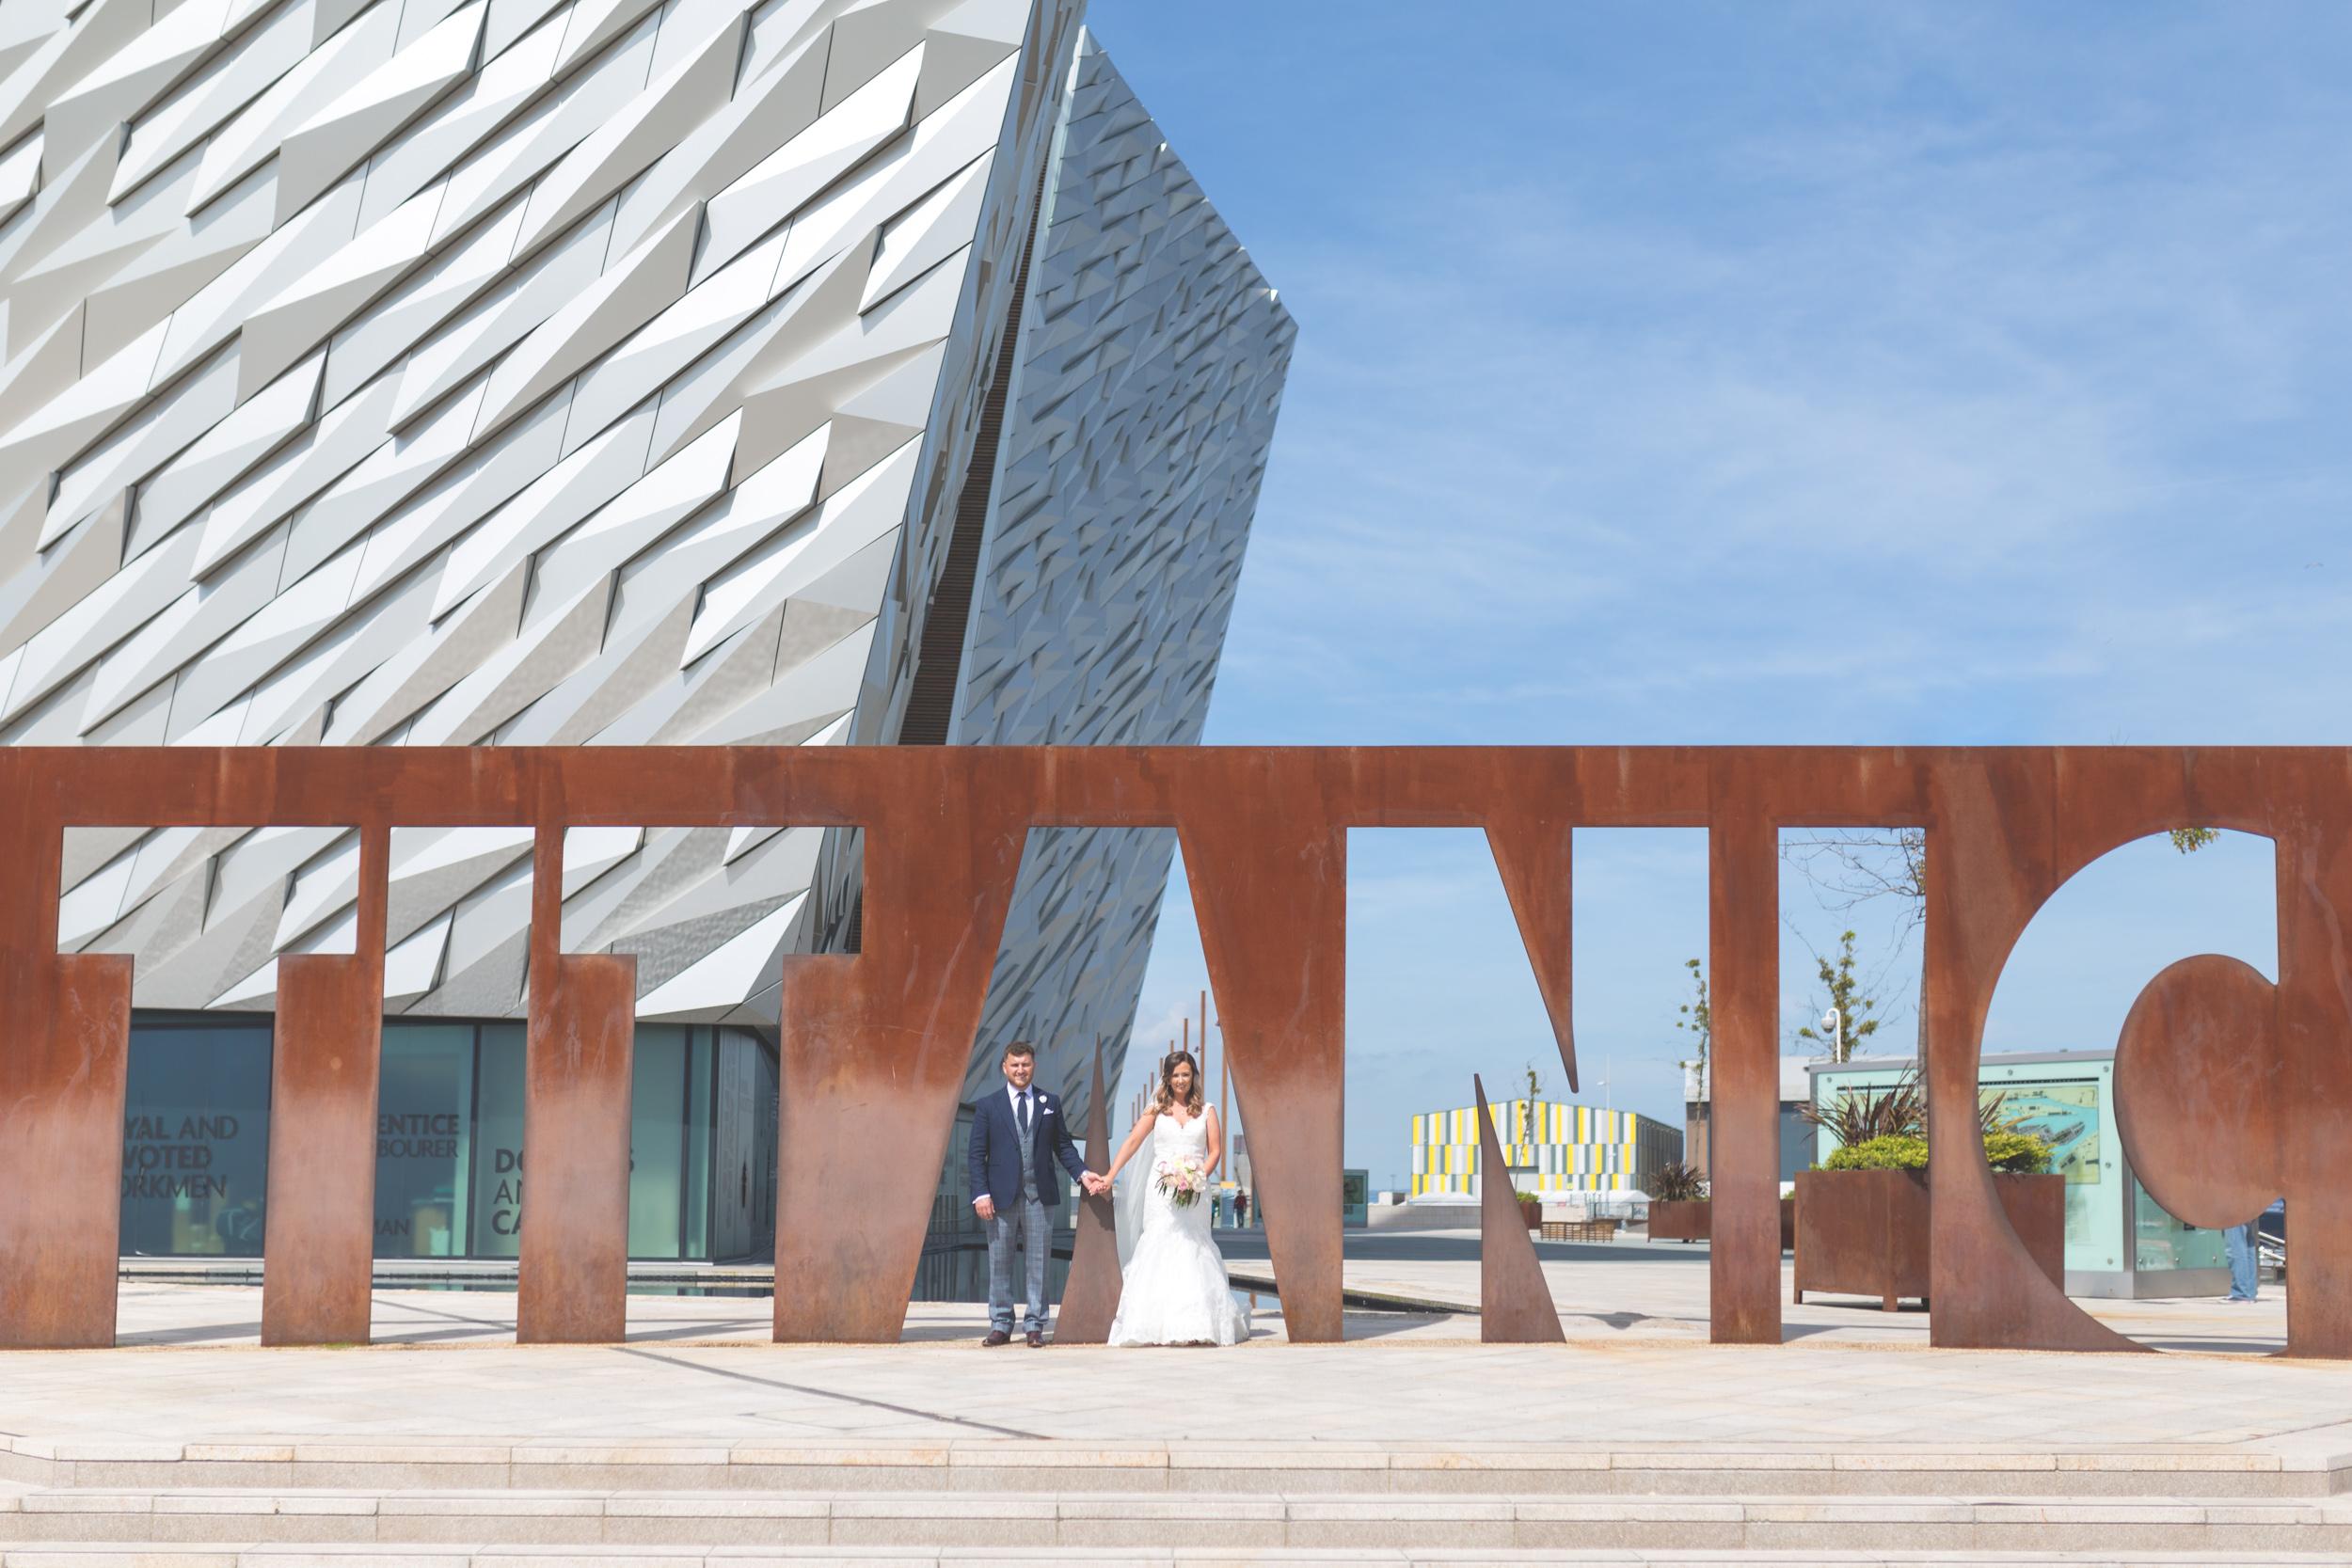 Brian McEwan   Northern Ireland Wedding Photographer   Rebecca & Michael   Portraits-72.jpg